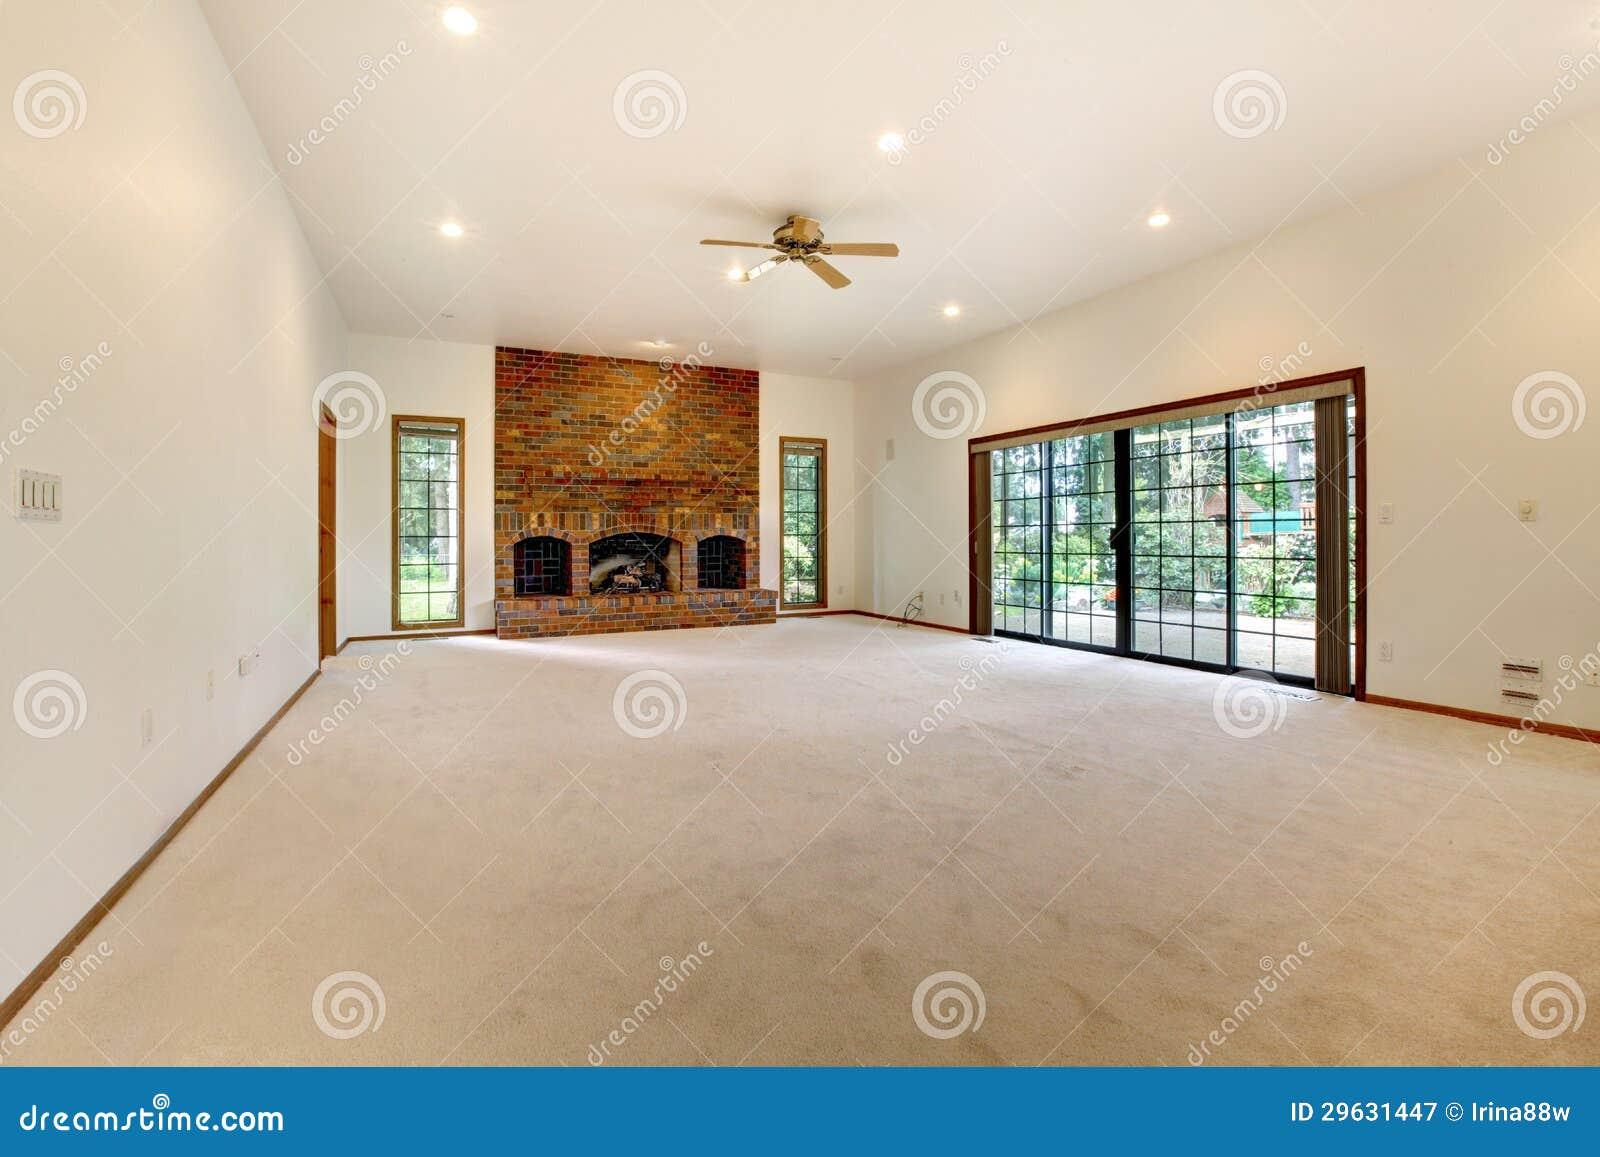 Big empty living room - Brick Empty Fireplace Large Living Room